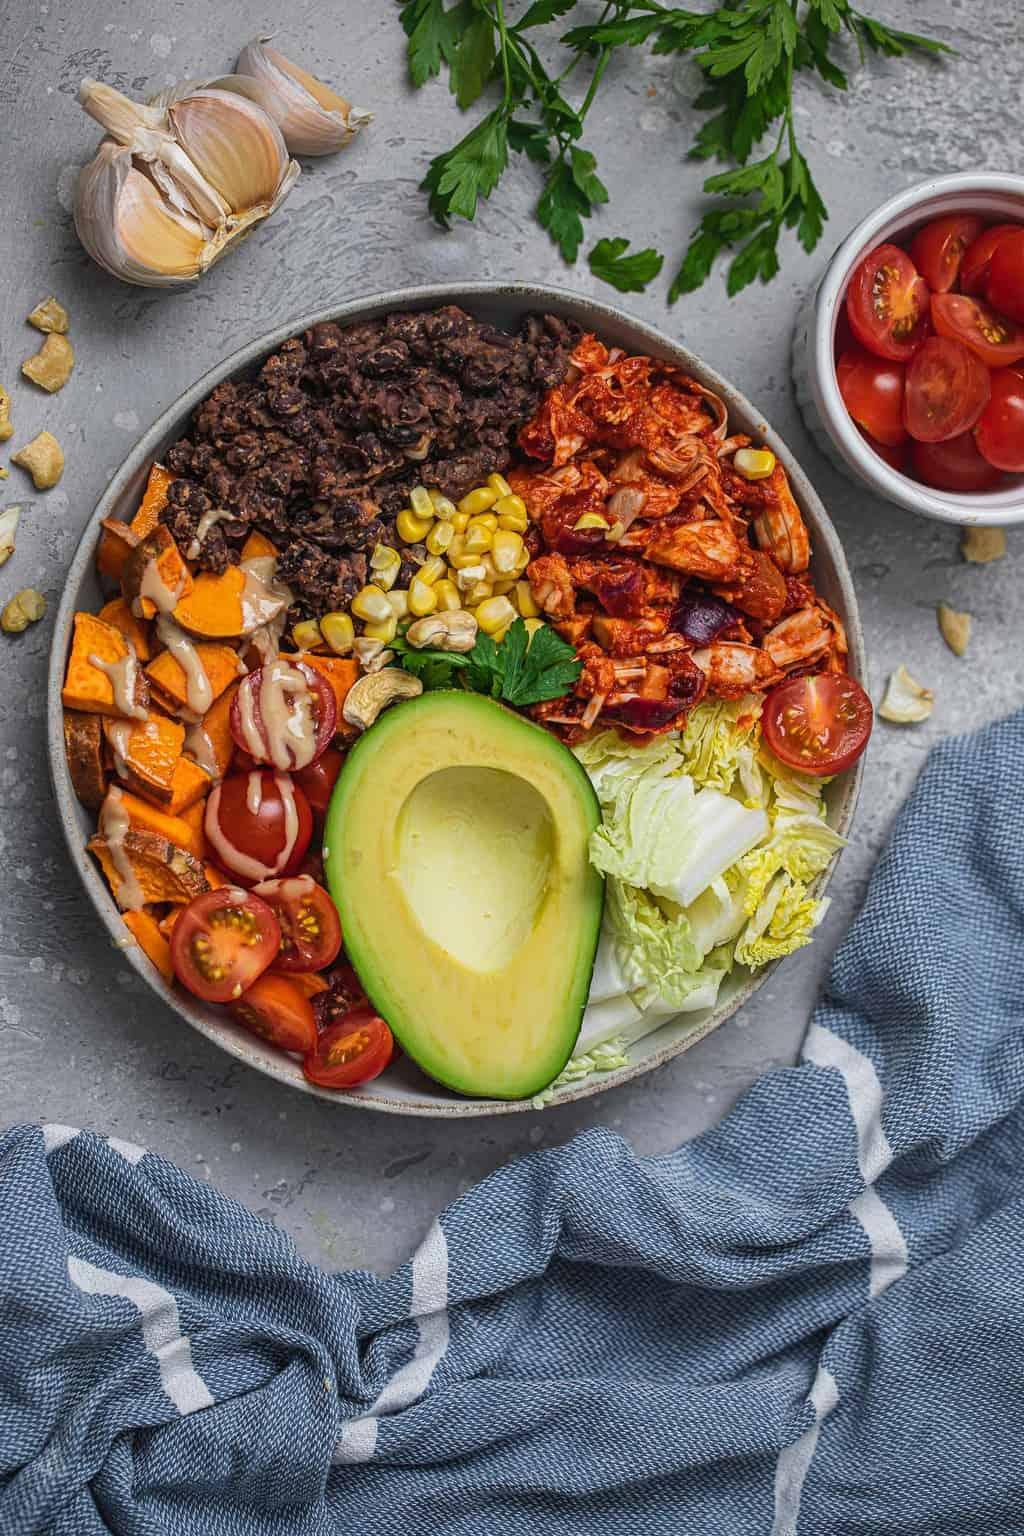 Breakfast burrito bowl with refried beans, smoky jackfruit, sweet potatoes, tomatoes, avocado and tahini